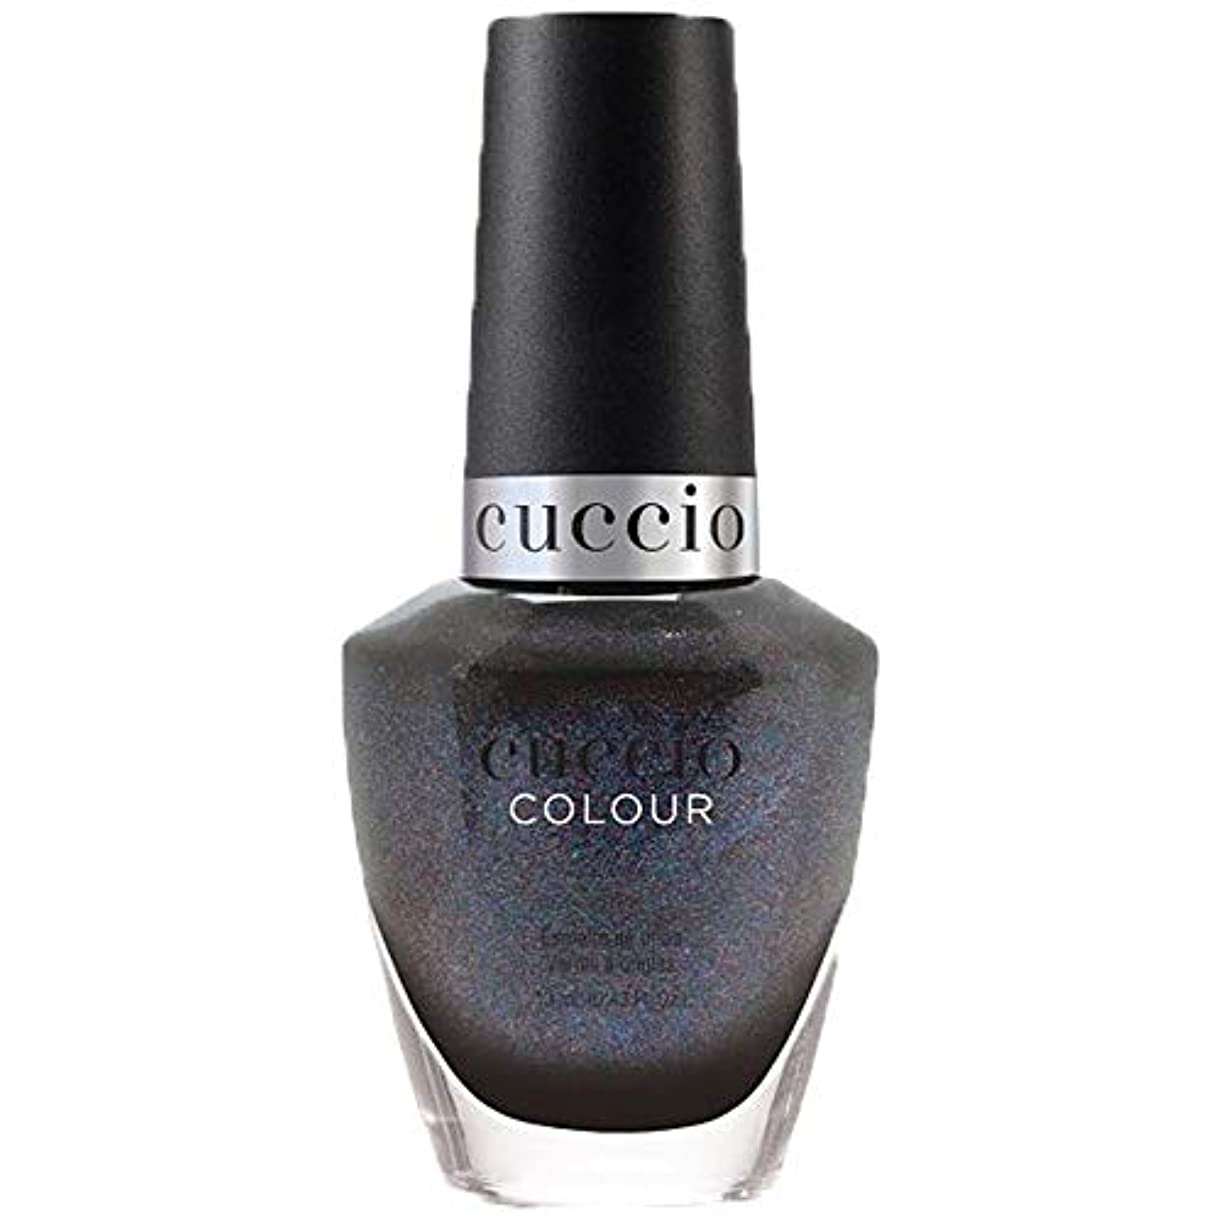 Cuccio Colour Nail Lacquer - Tapestry Collection - Cover Me Up! - 13 mL / 0.43 oz